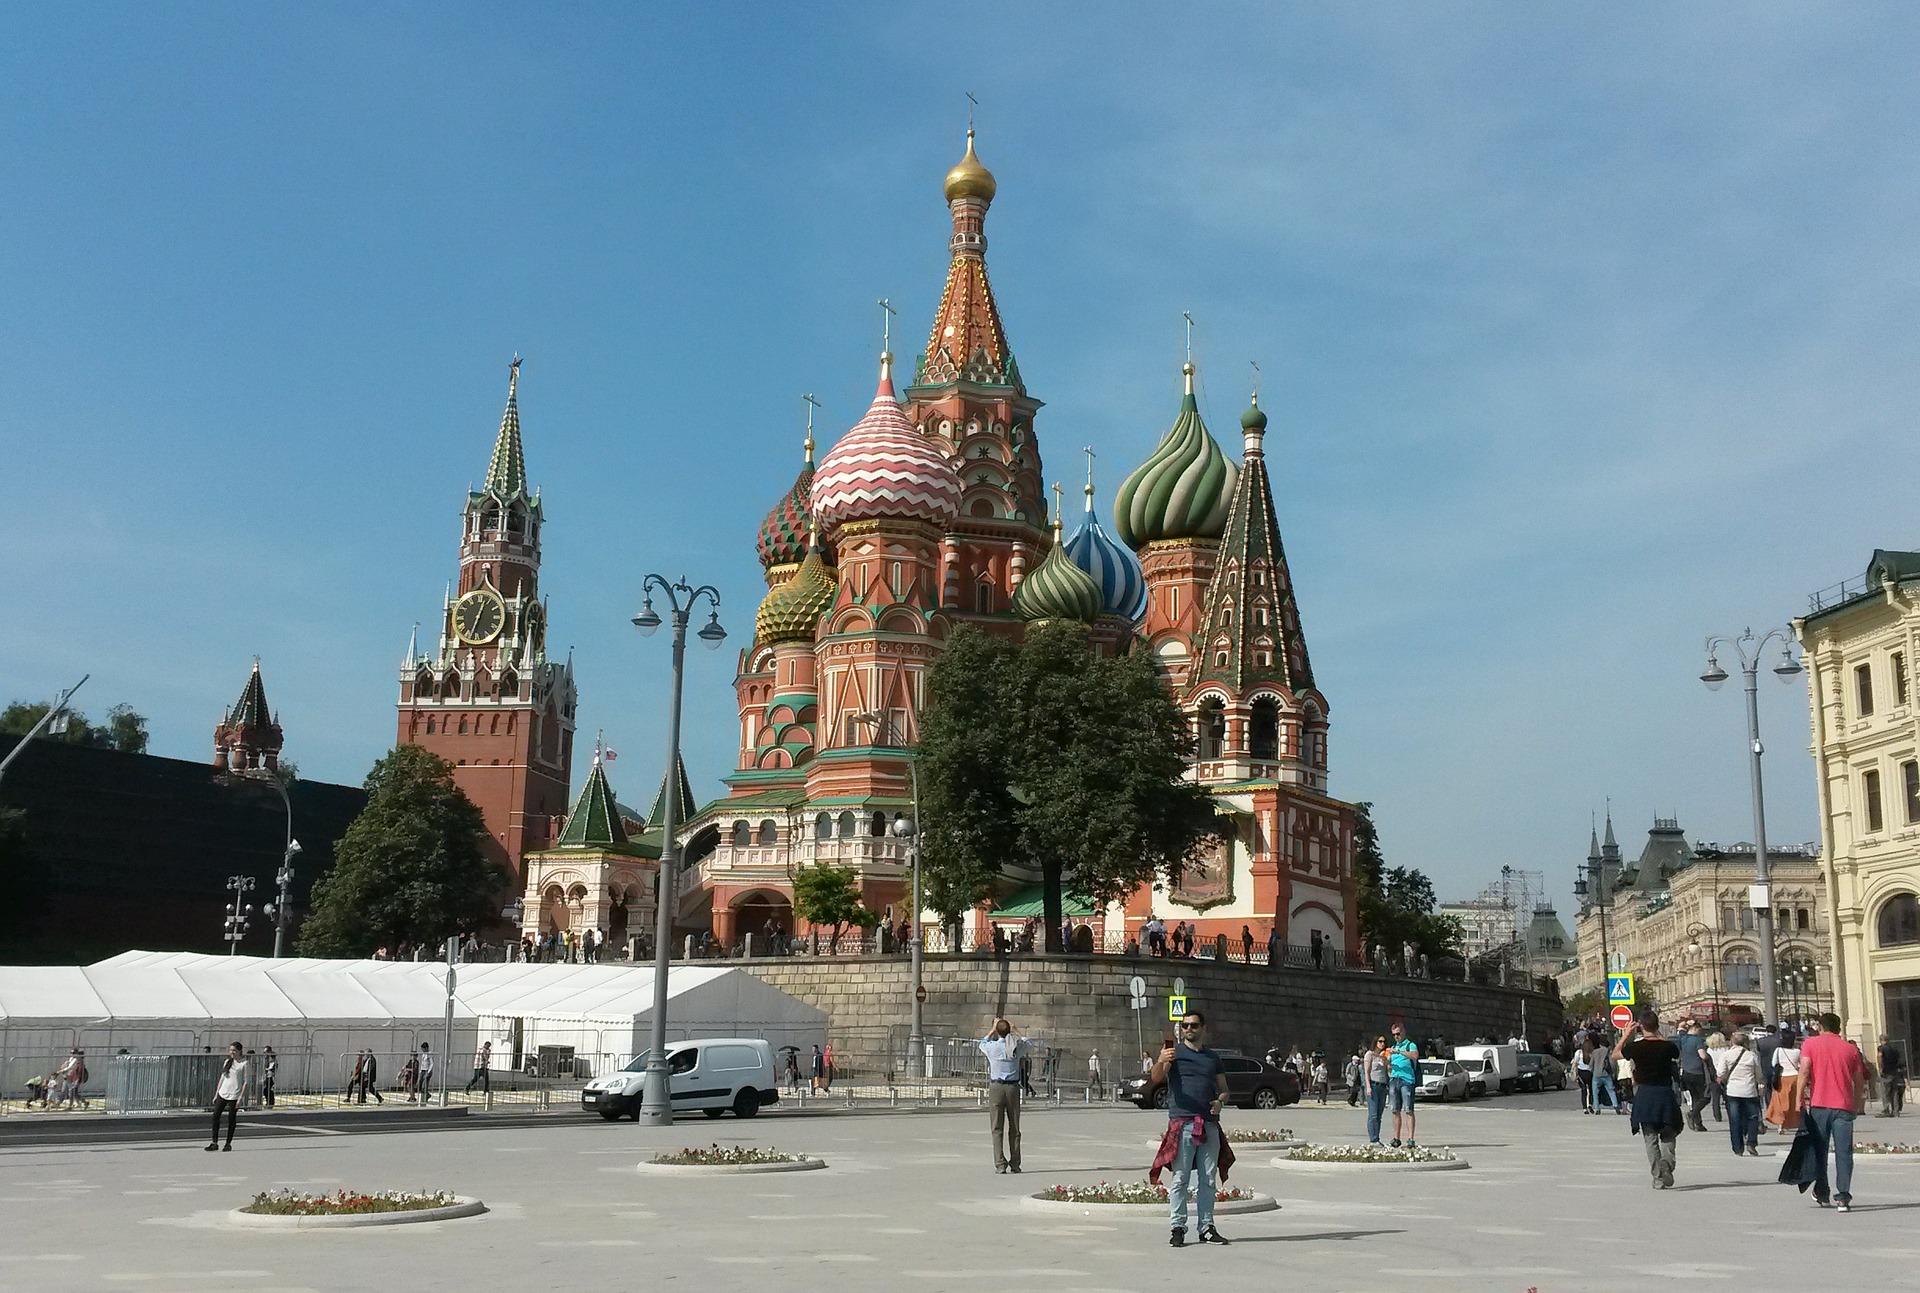 10 lugares turísticos que debes visitar si vas a Rusia